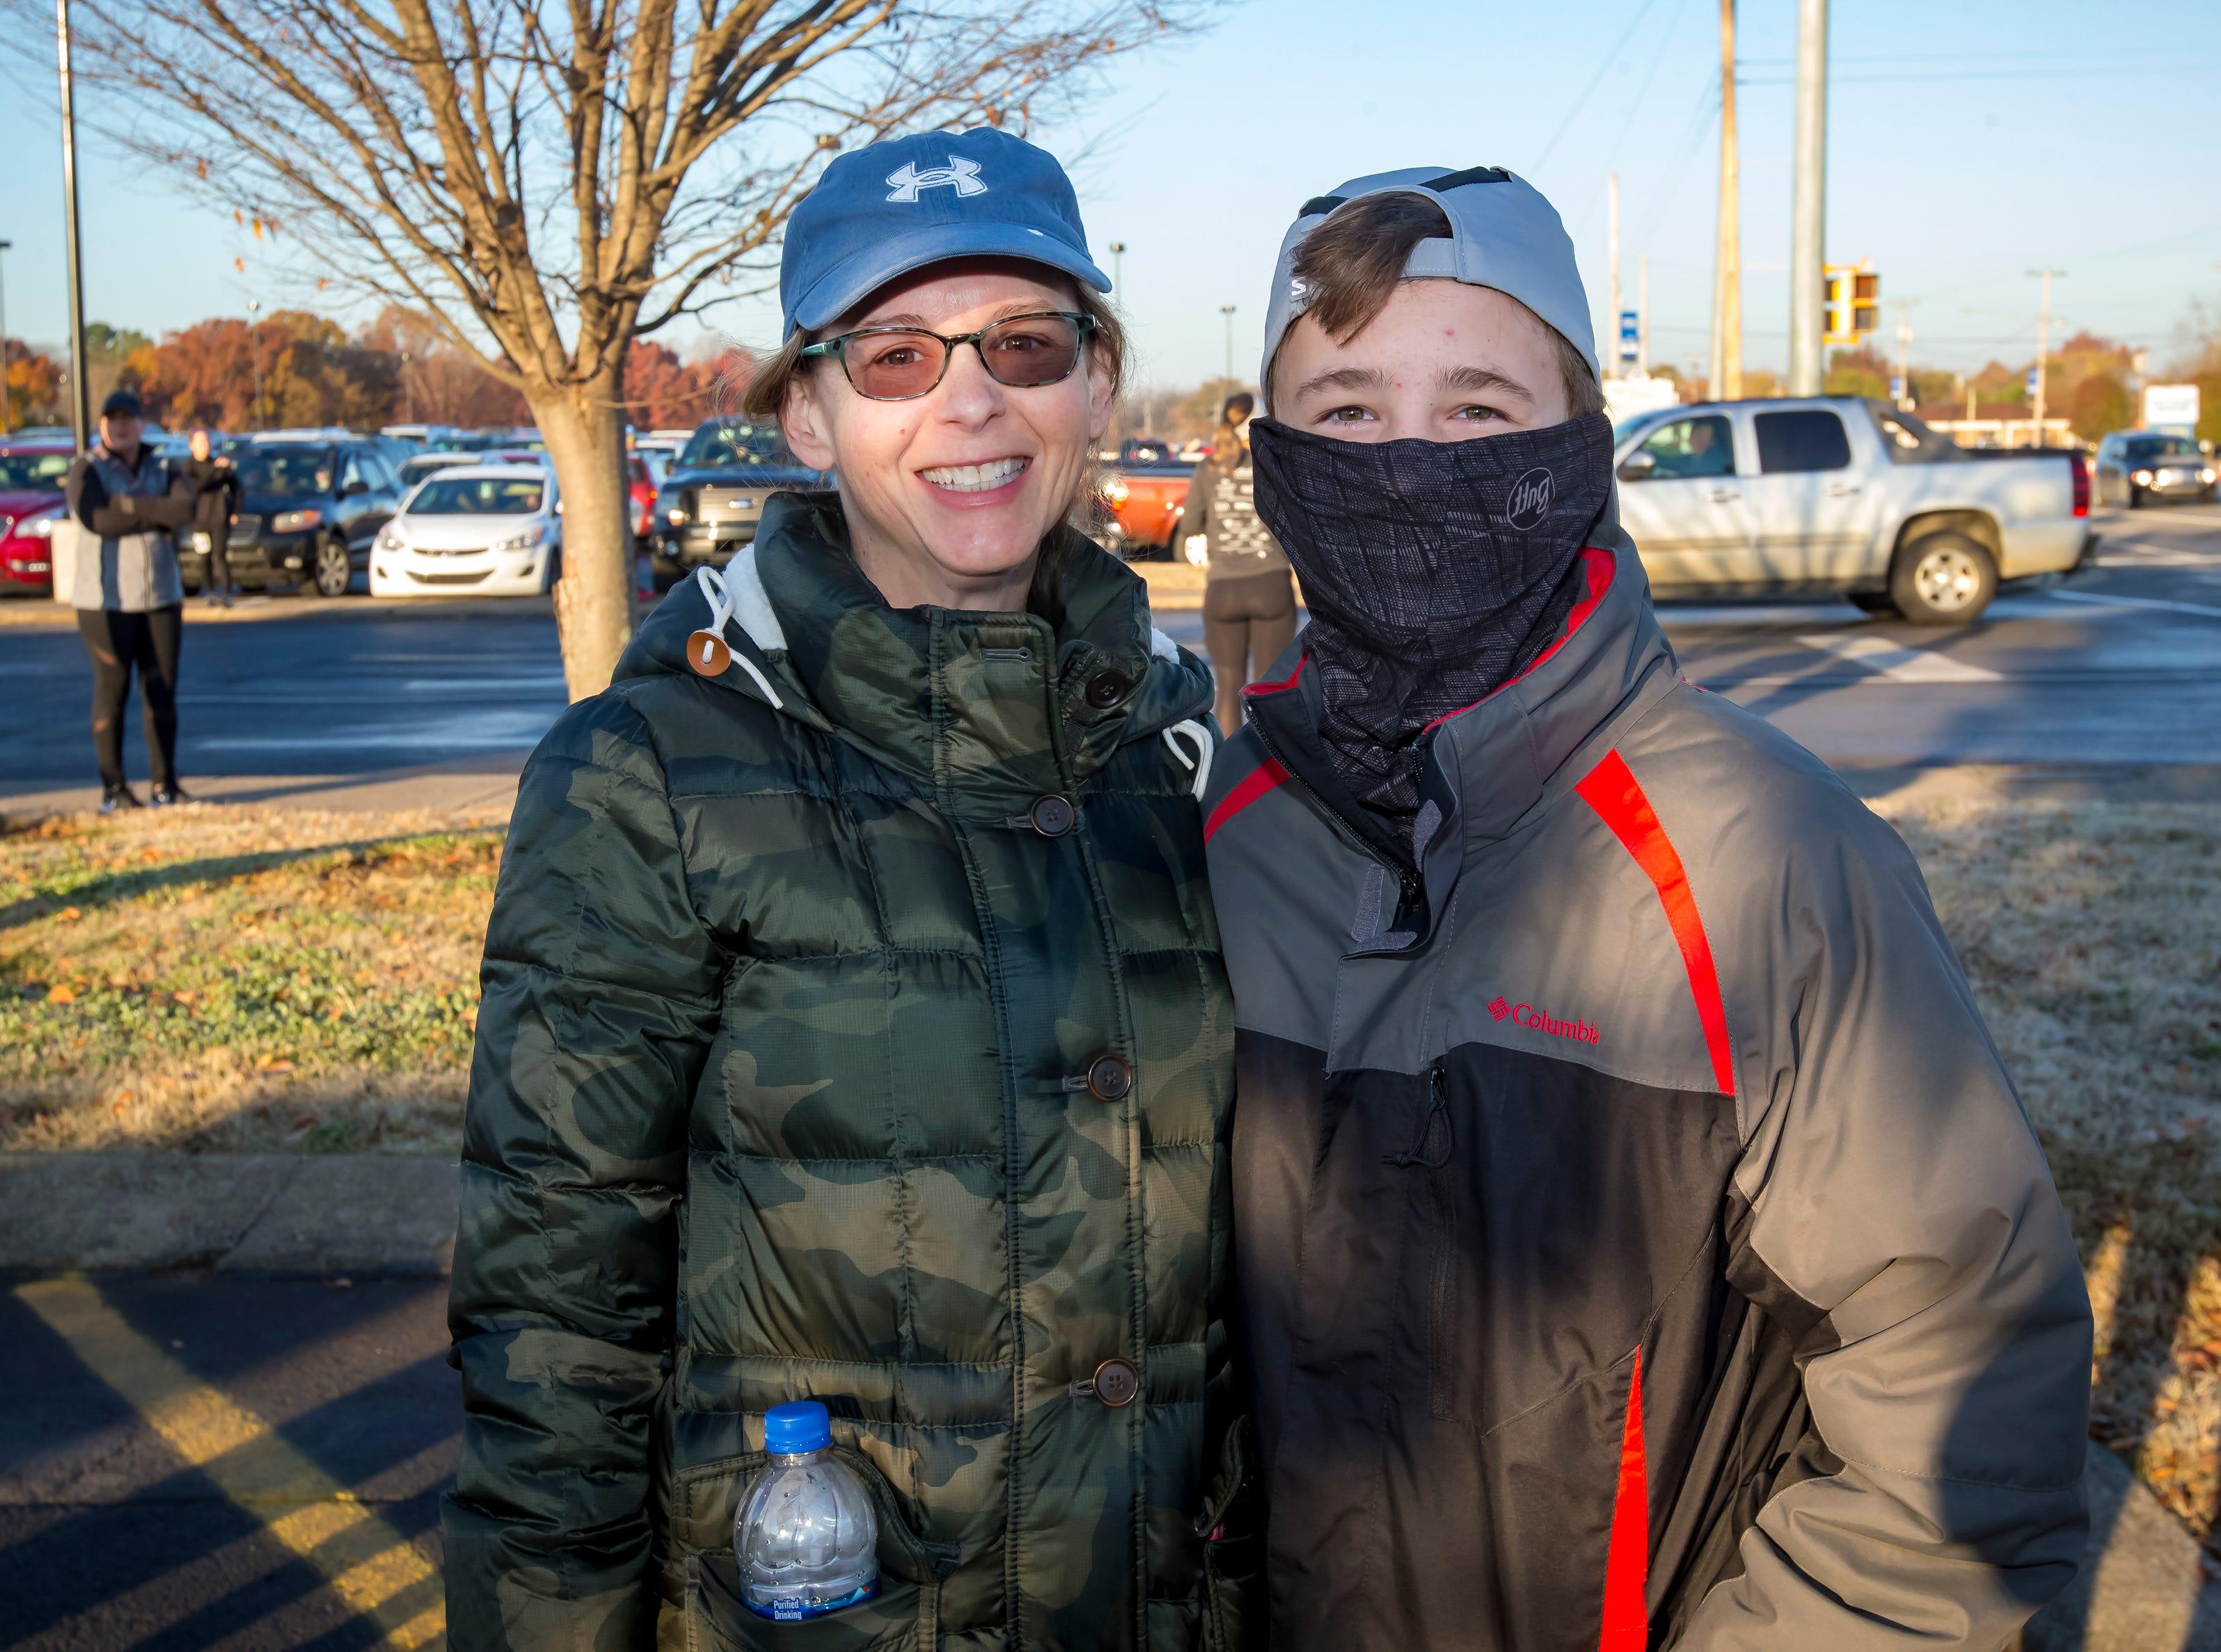 Kelly and Logan Kelley at the Thanksgiving Day Borodash. A 4-mile walk/run through historic Murfreesboro.Jim Davis/for the DNJ